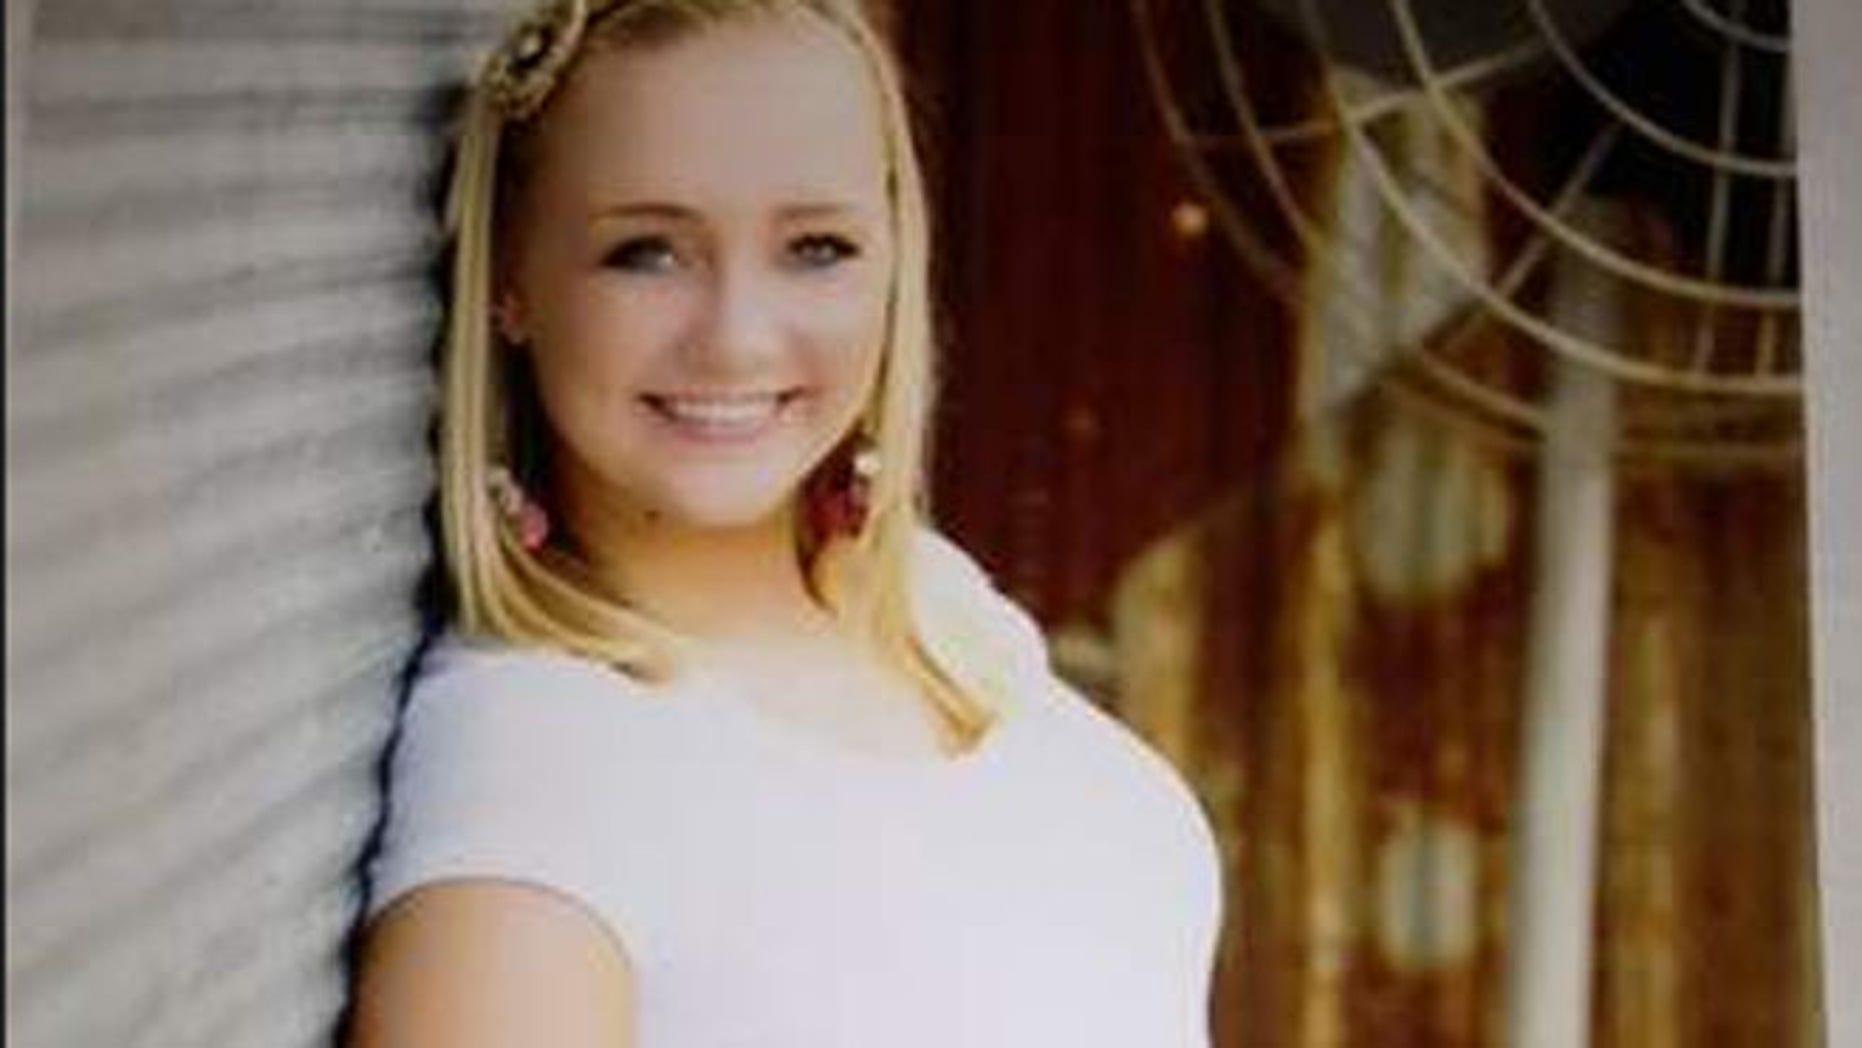 The body of Peyton Riekhof was found submerged in a Geist neighborhood reservoir.